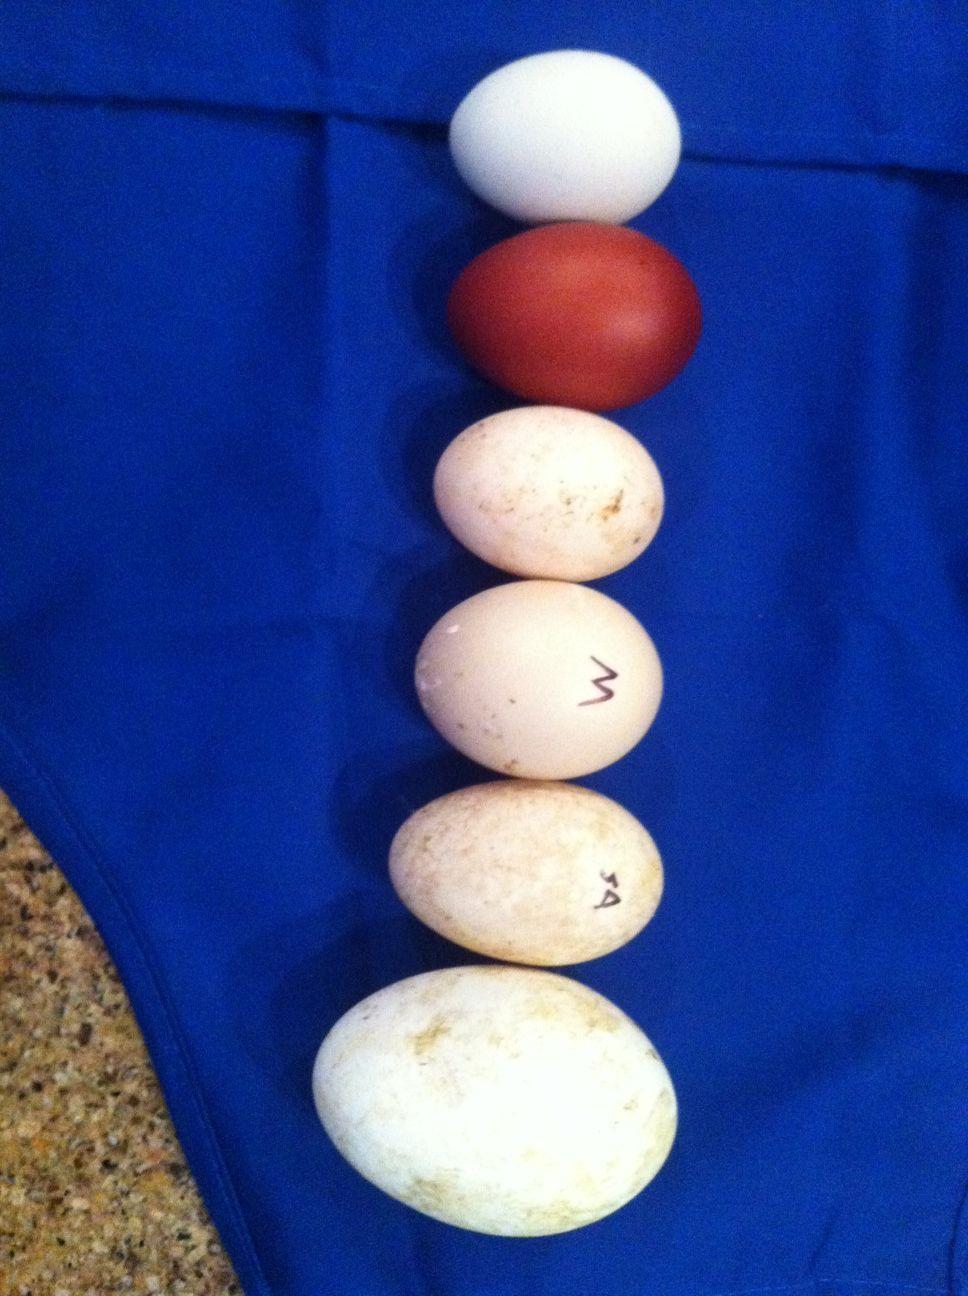 CelticOaksFarm's photos in PayPal/Hatching Eggs/Chicks Swap